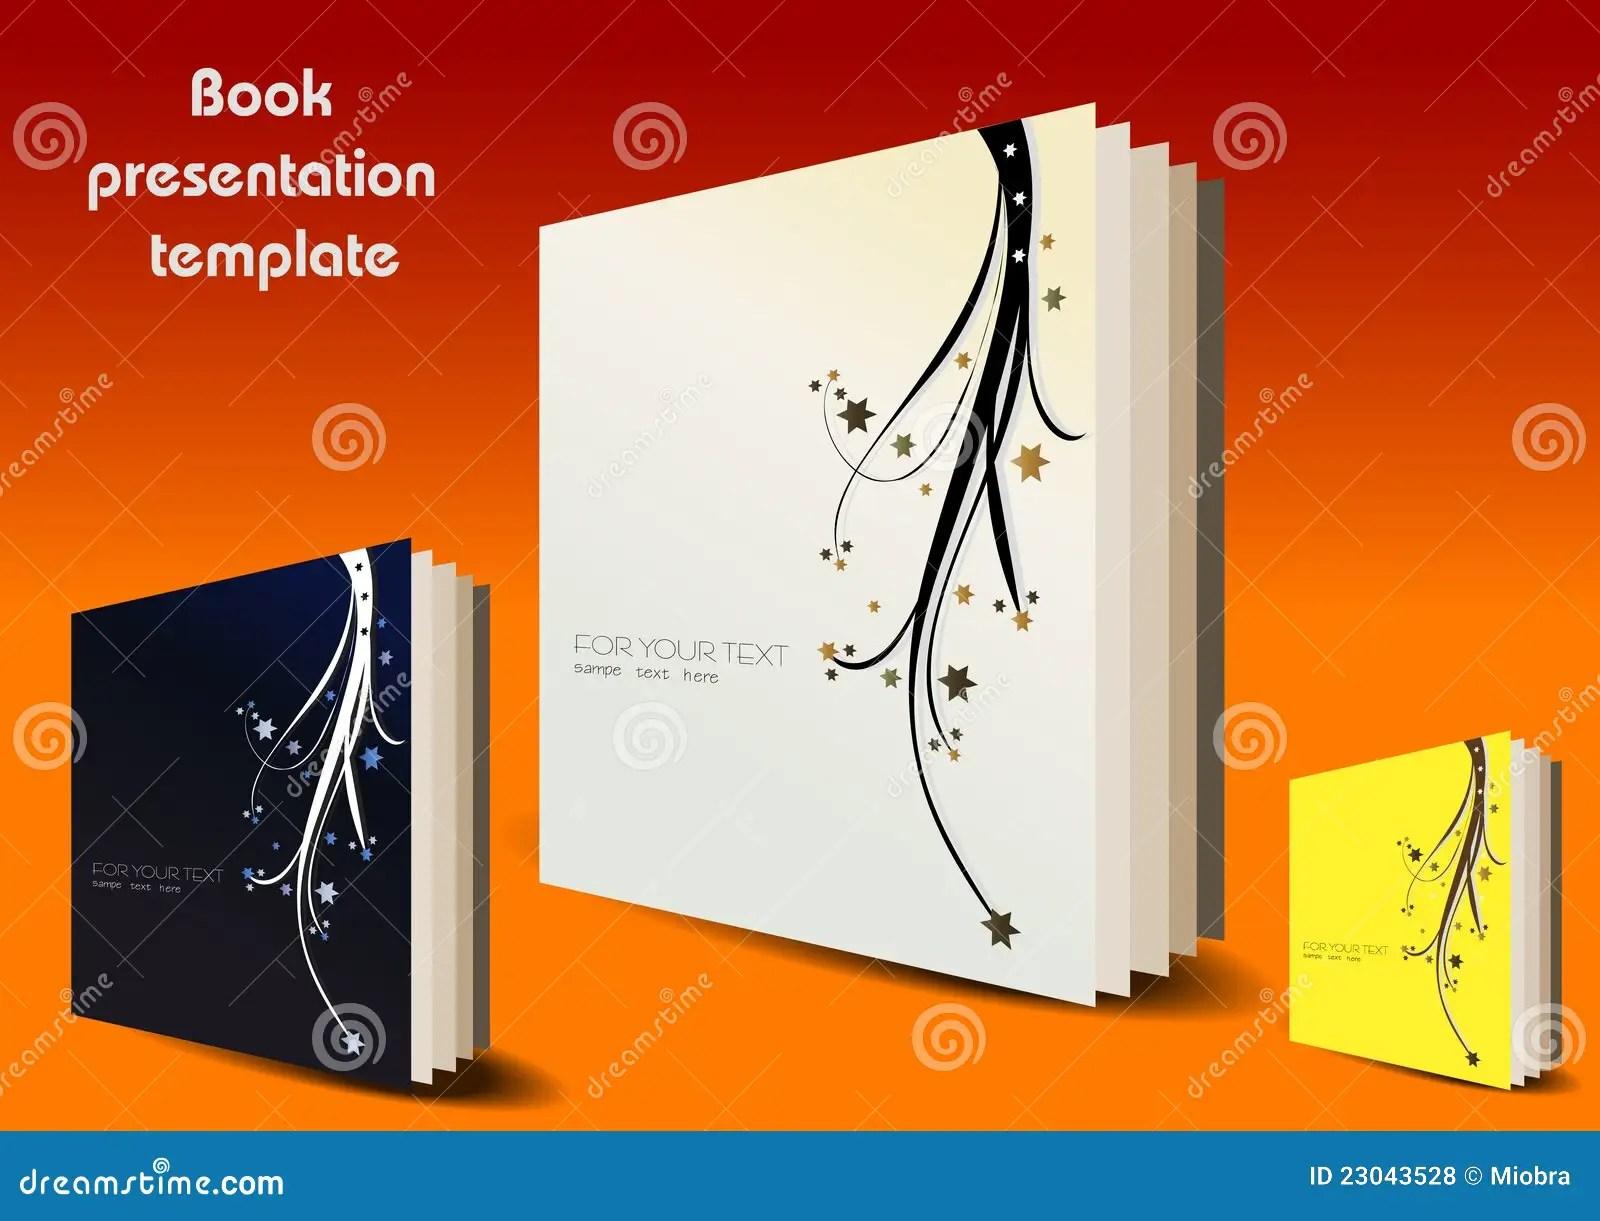 Book presentation template stock vector Illustration of health  23043528